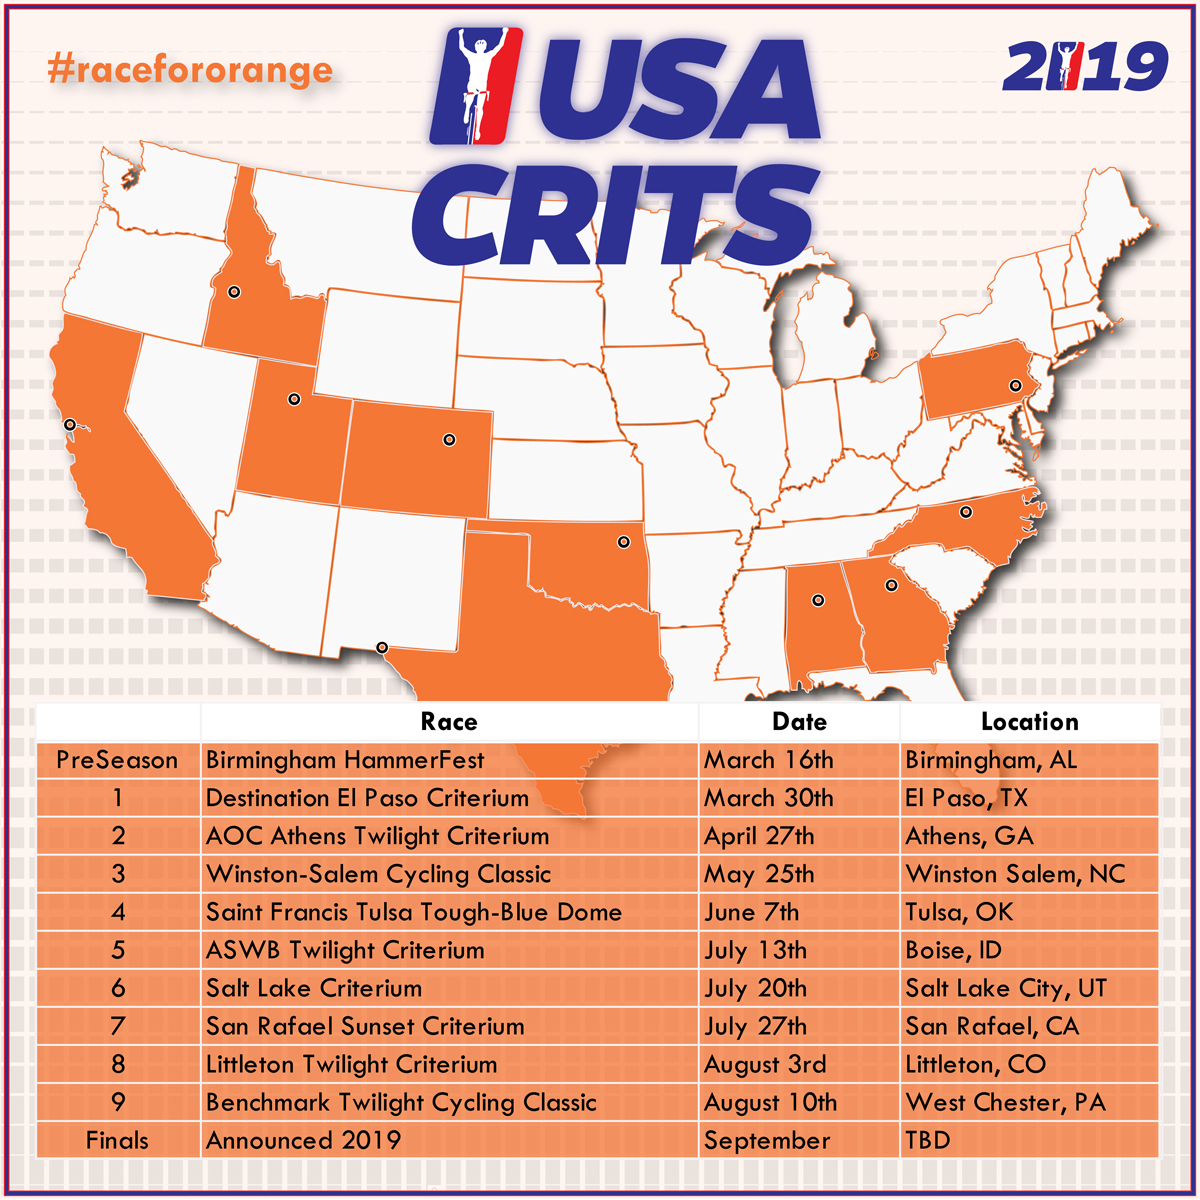 USA Crits 2019 schedule  - Cycling West - Cycling Utah